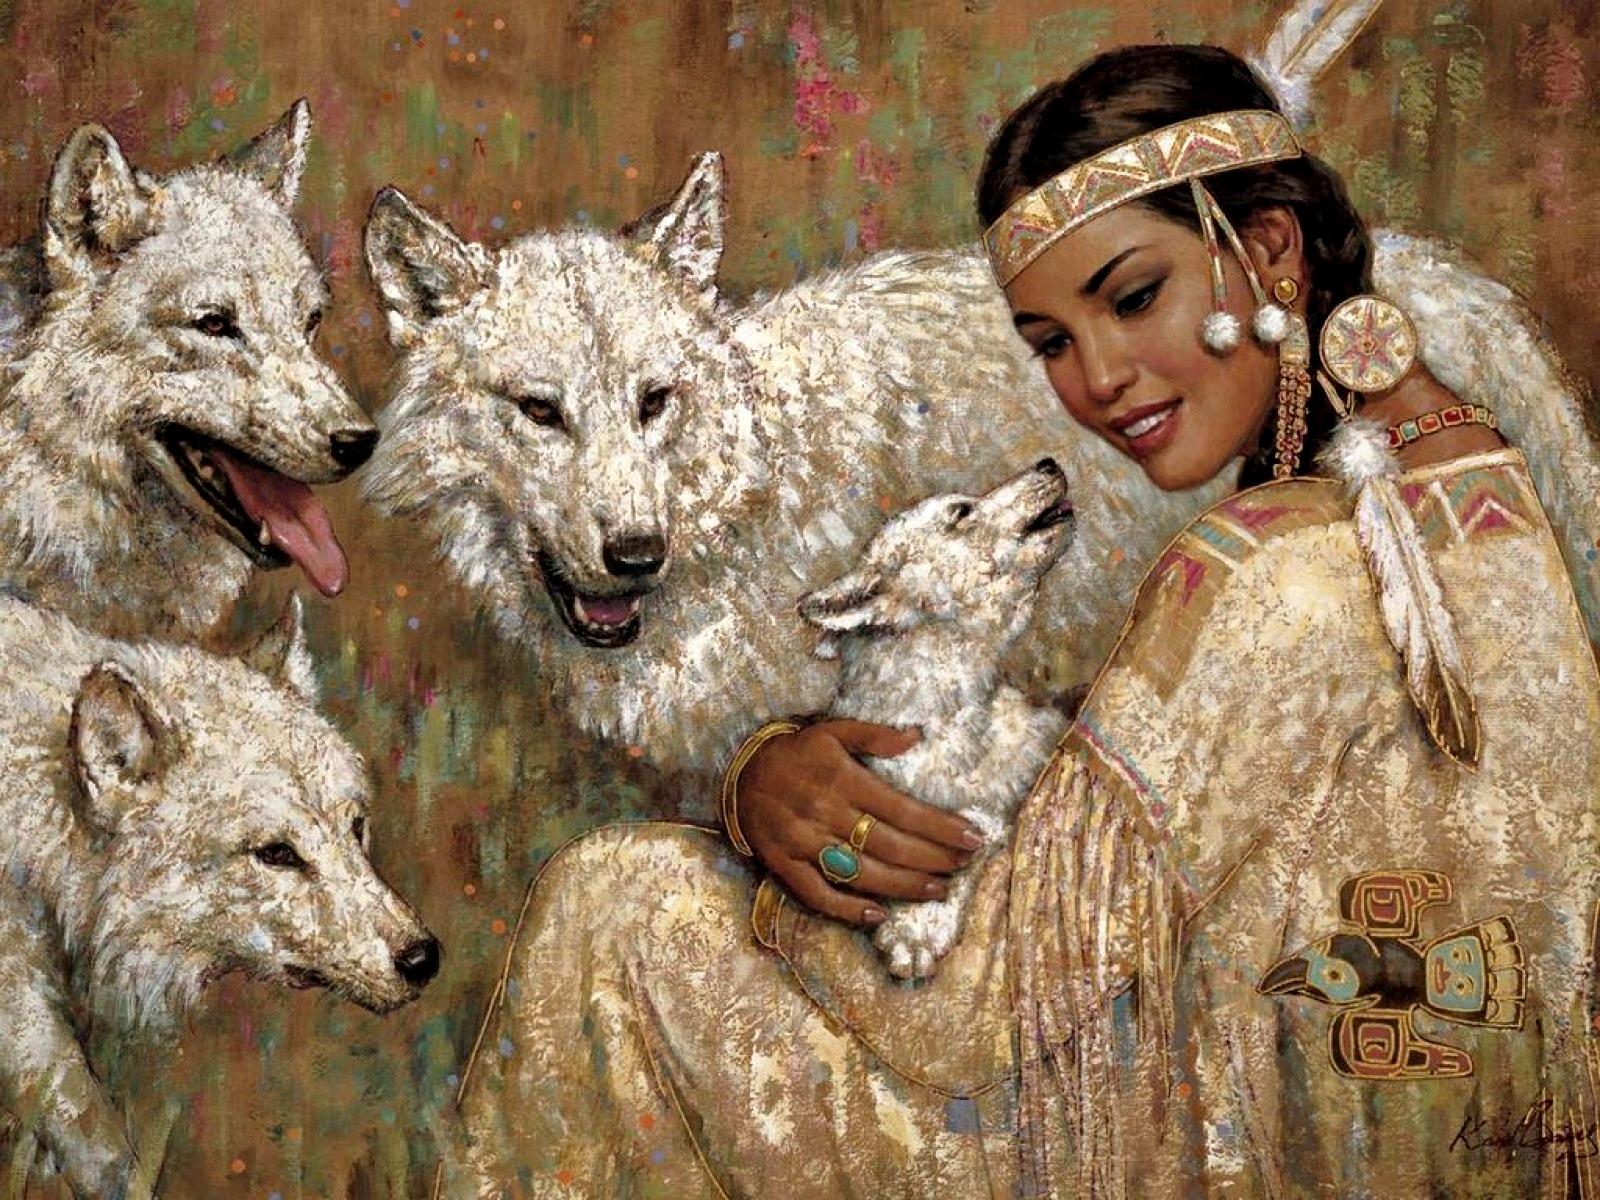 native american Wallpaper Background 12482 1600x1200